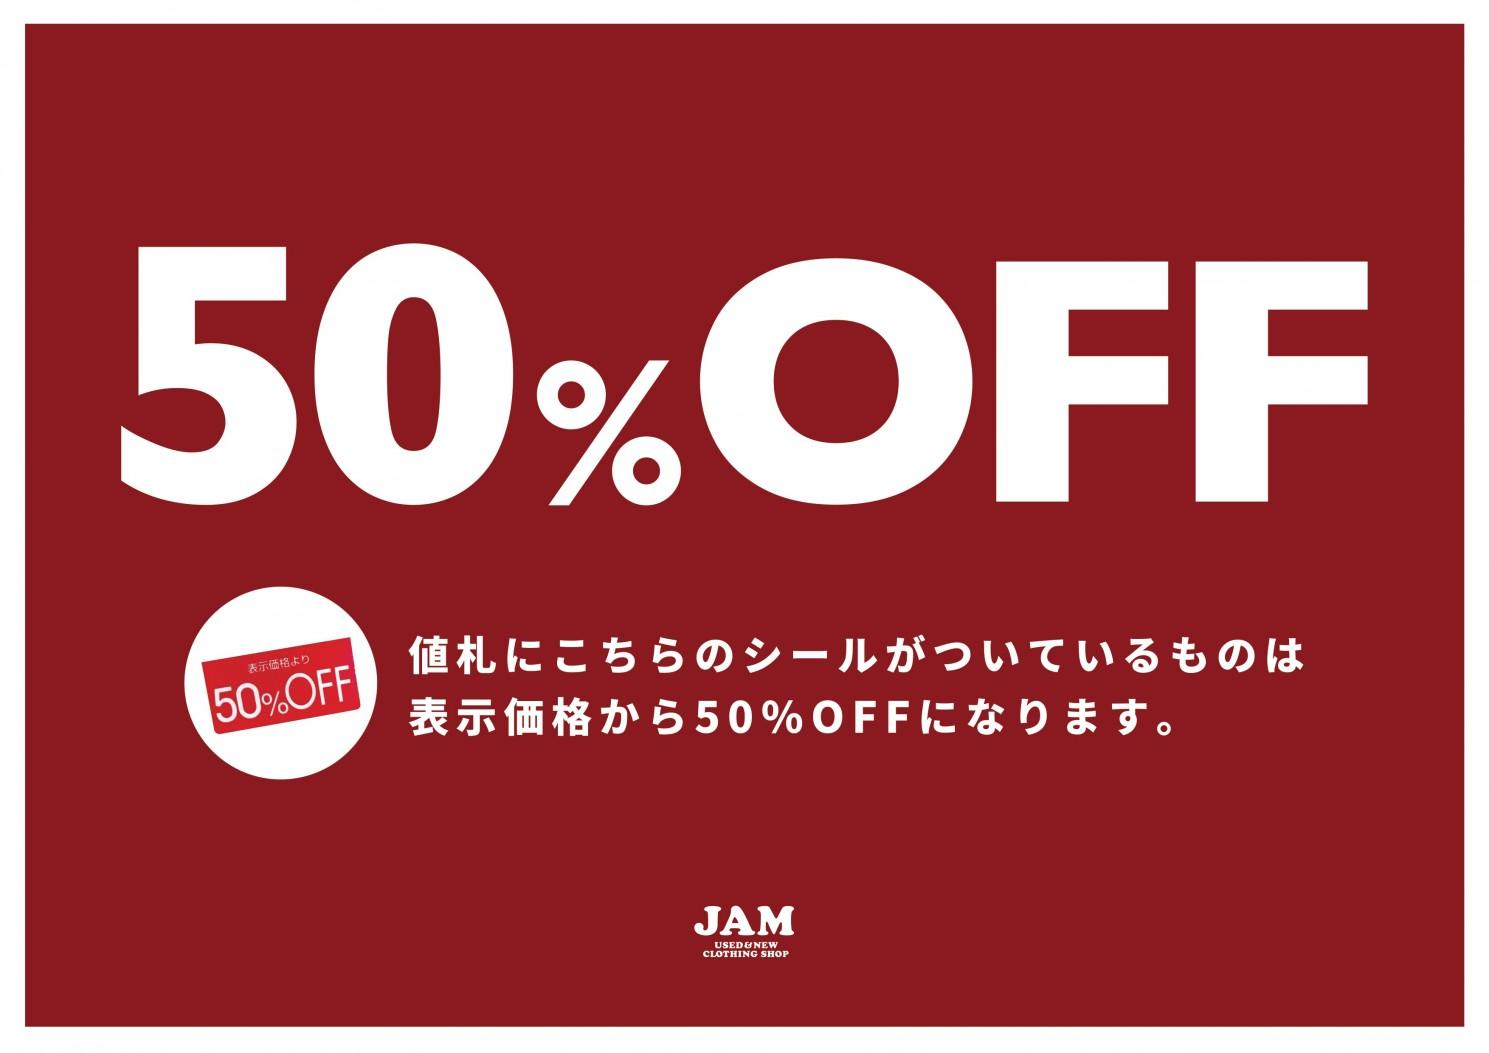 50%off_A4_jam_print (1)